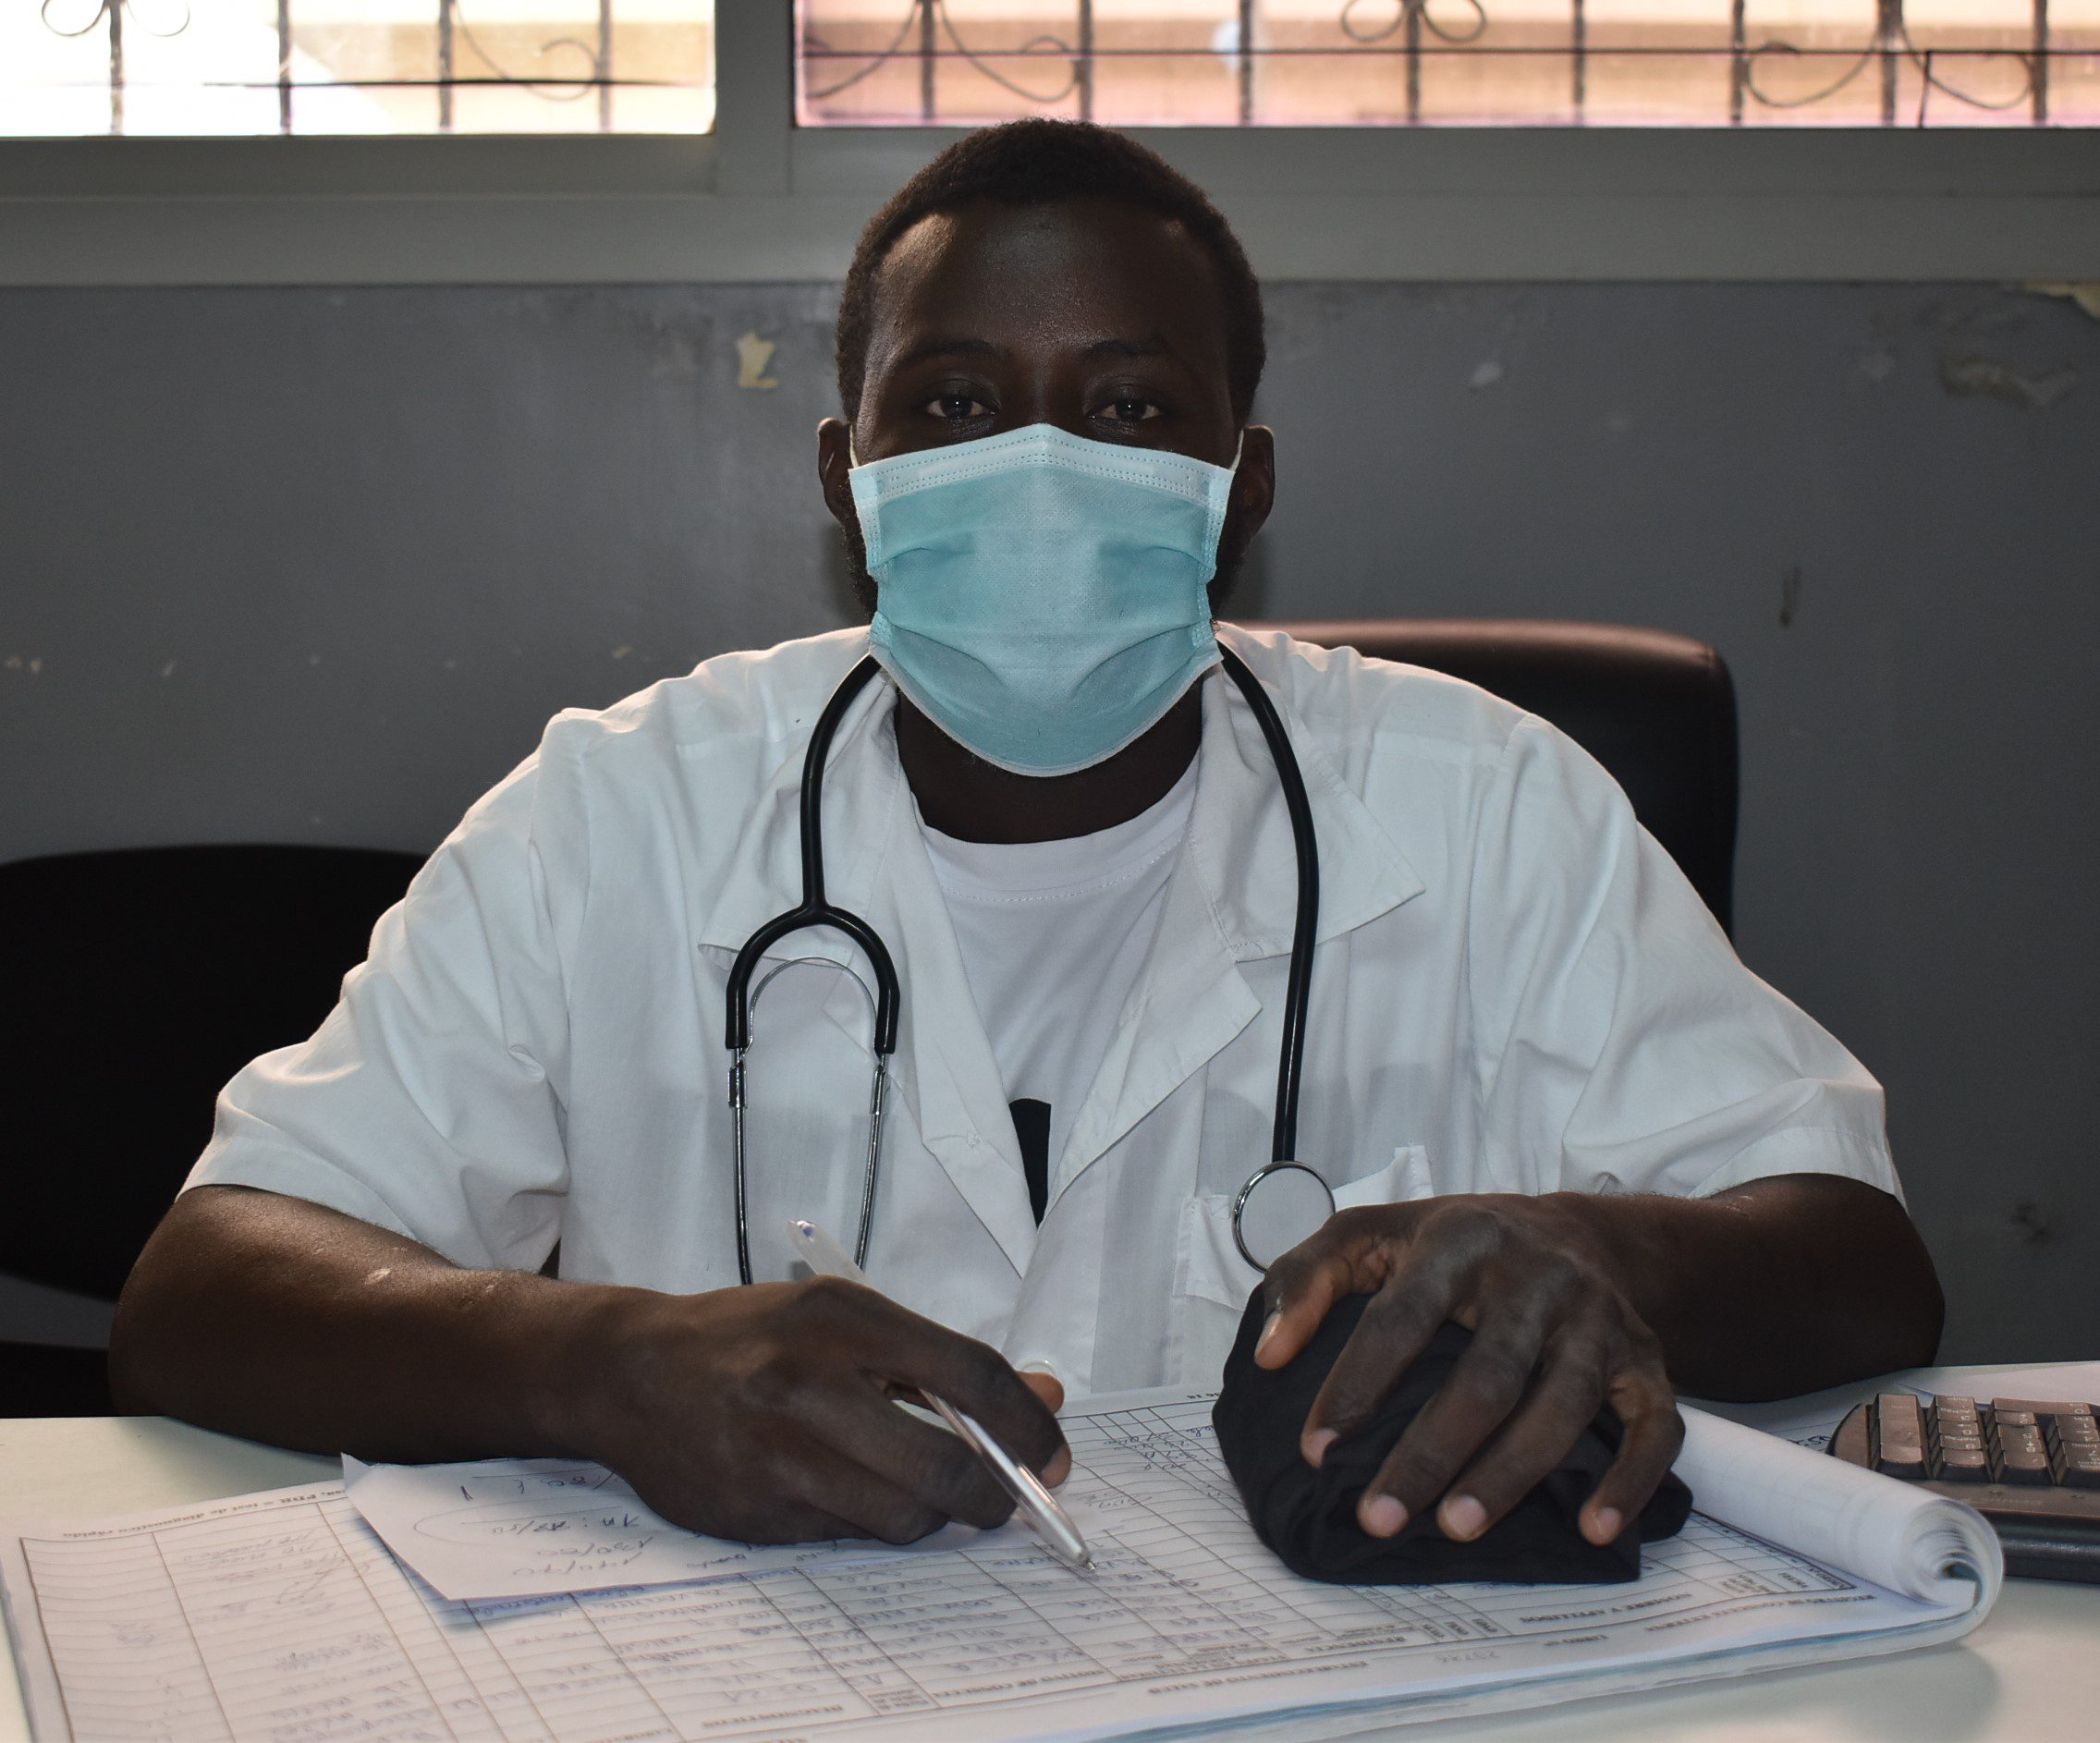 De cada 100 pacientes adultos que pasan por el Hospital General de Malabo, 60 son hipertensos